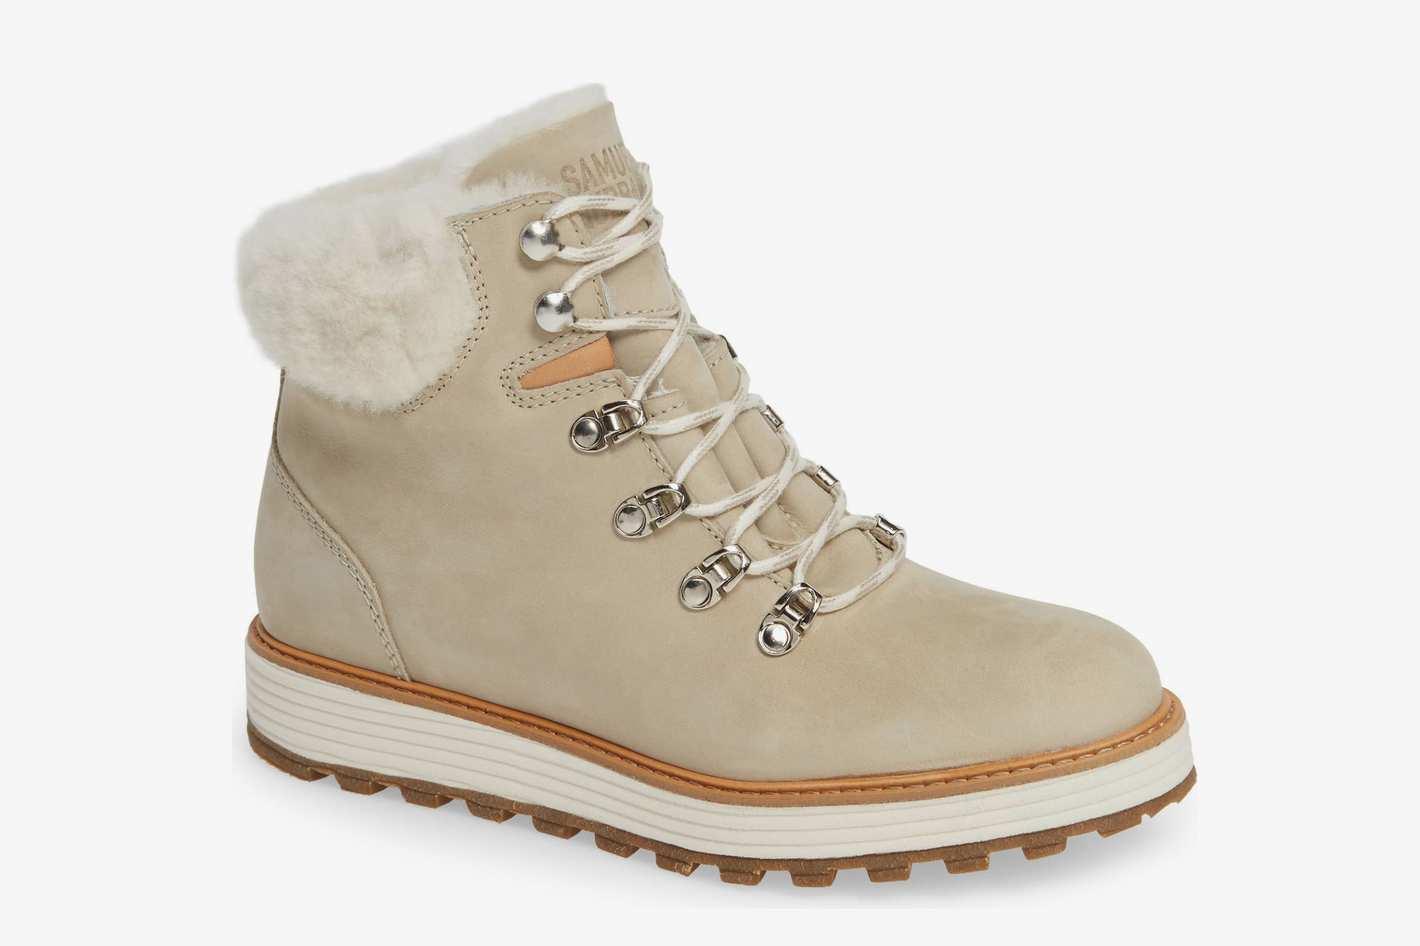 Samuel Hubbard Alpine Water-Resistant Genuine-Shearling-Lined Boot